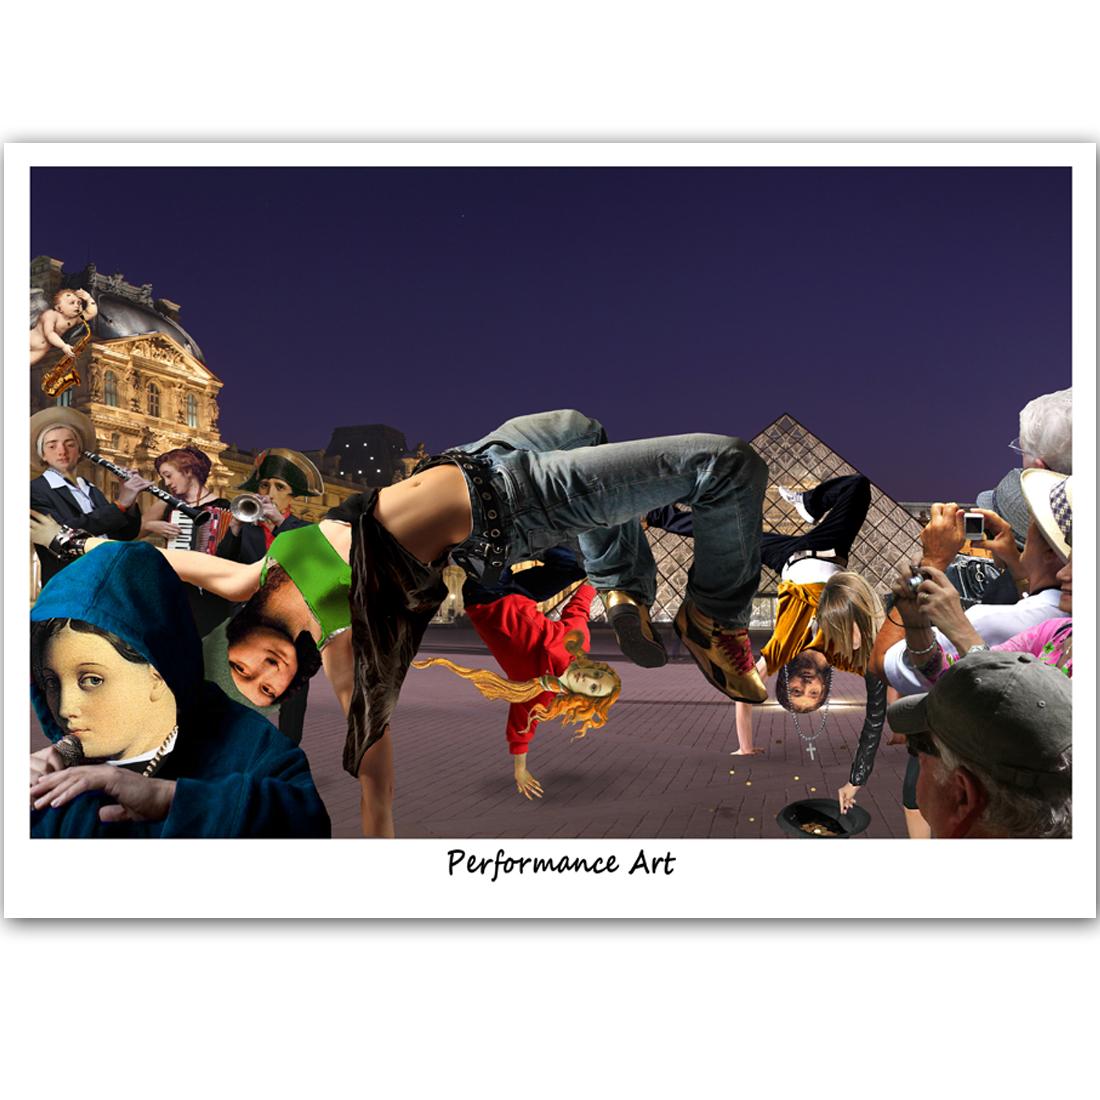 C451 Perfornance Art